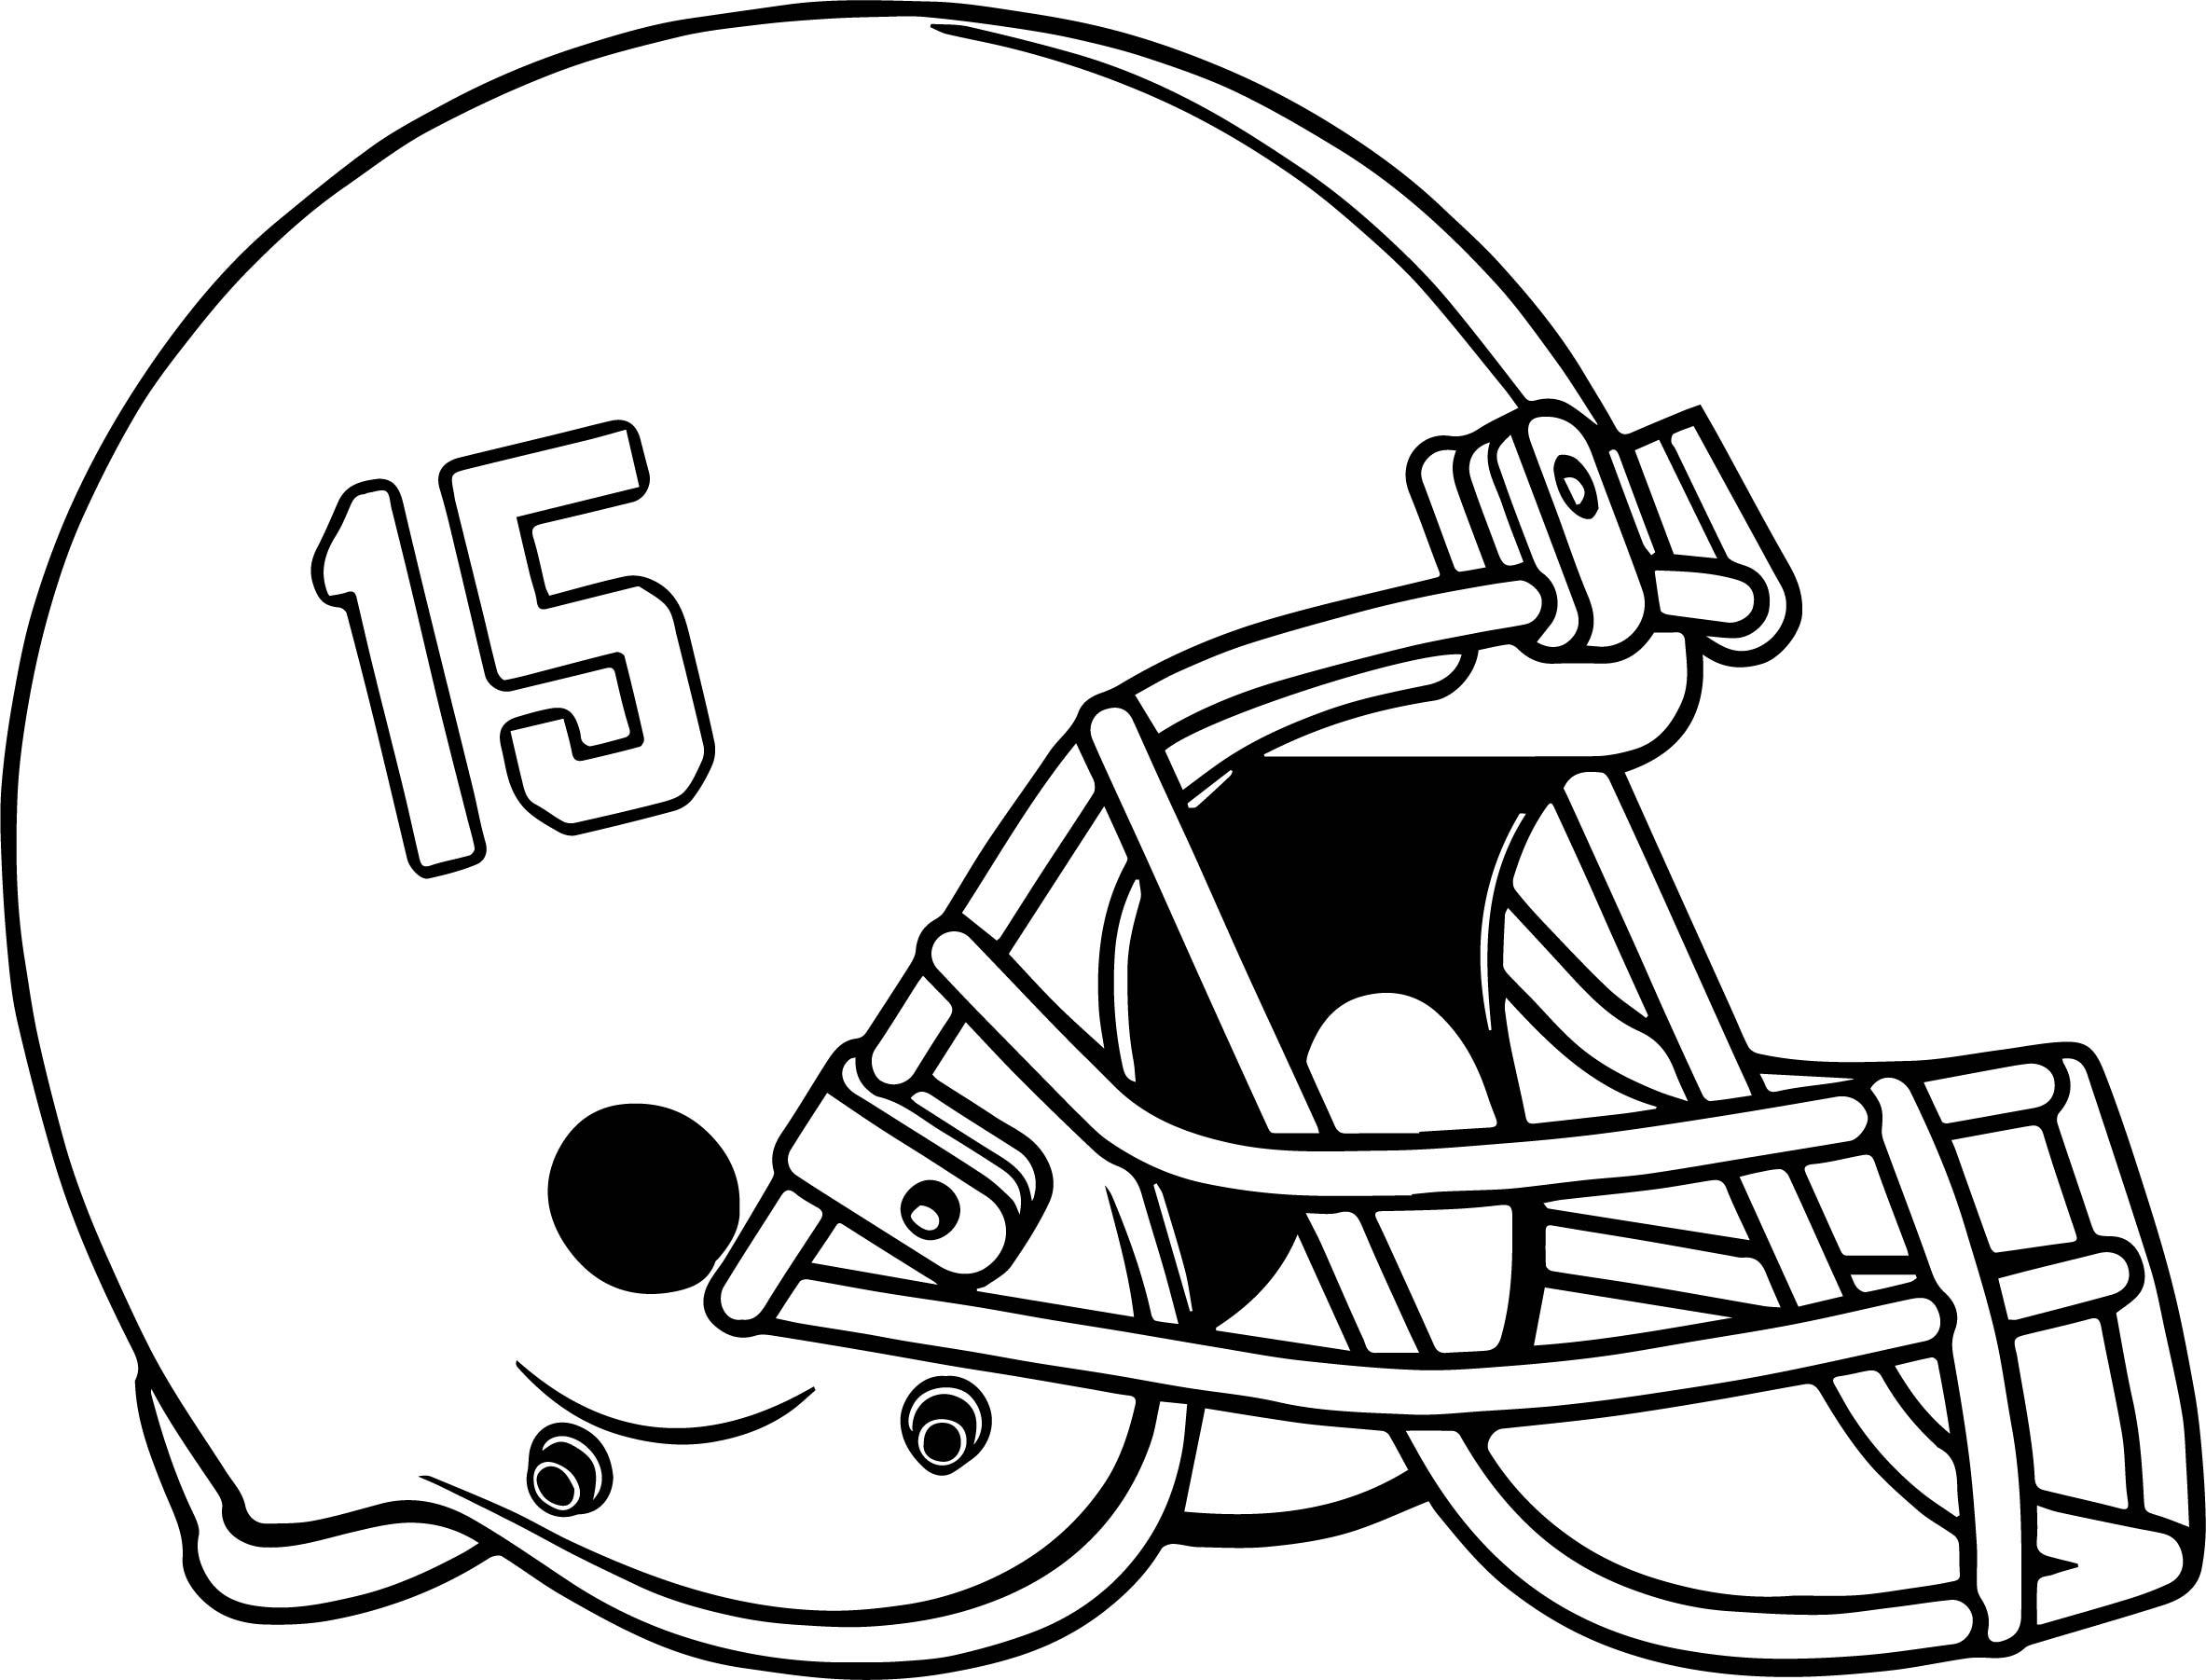 Football Helmets Drawing At Getdrawings